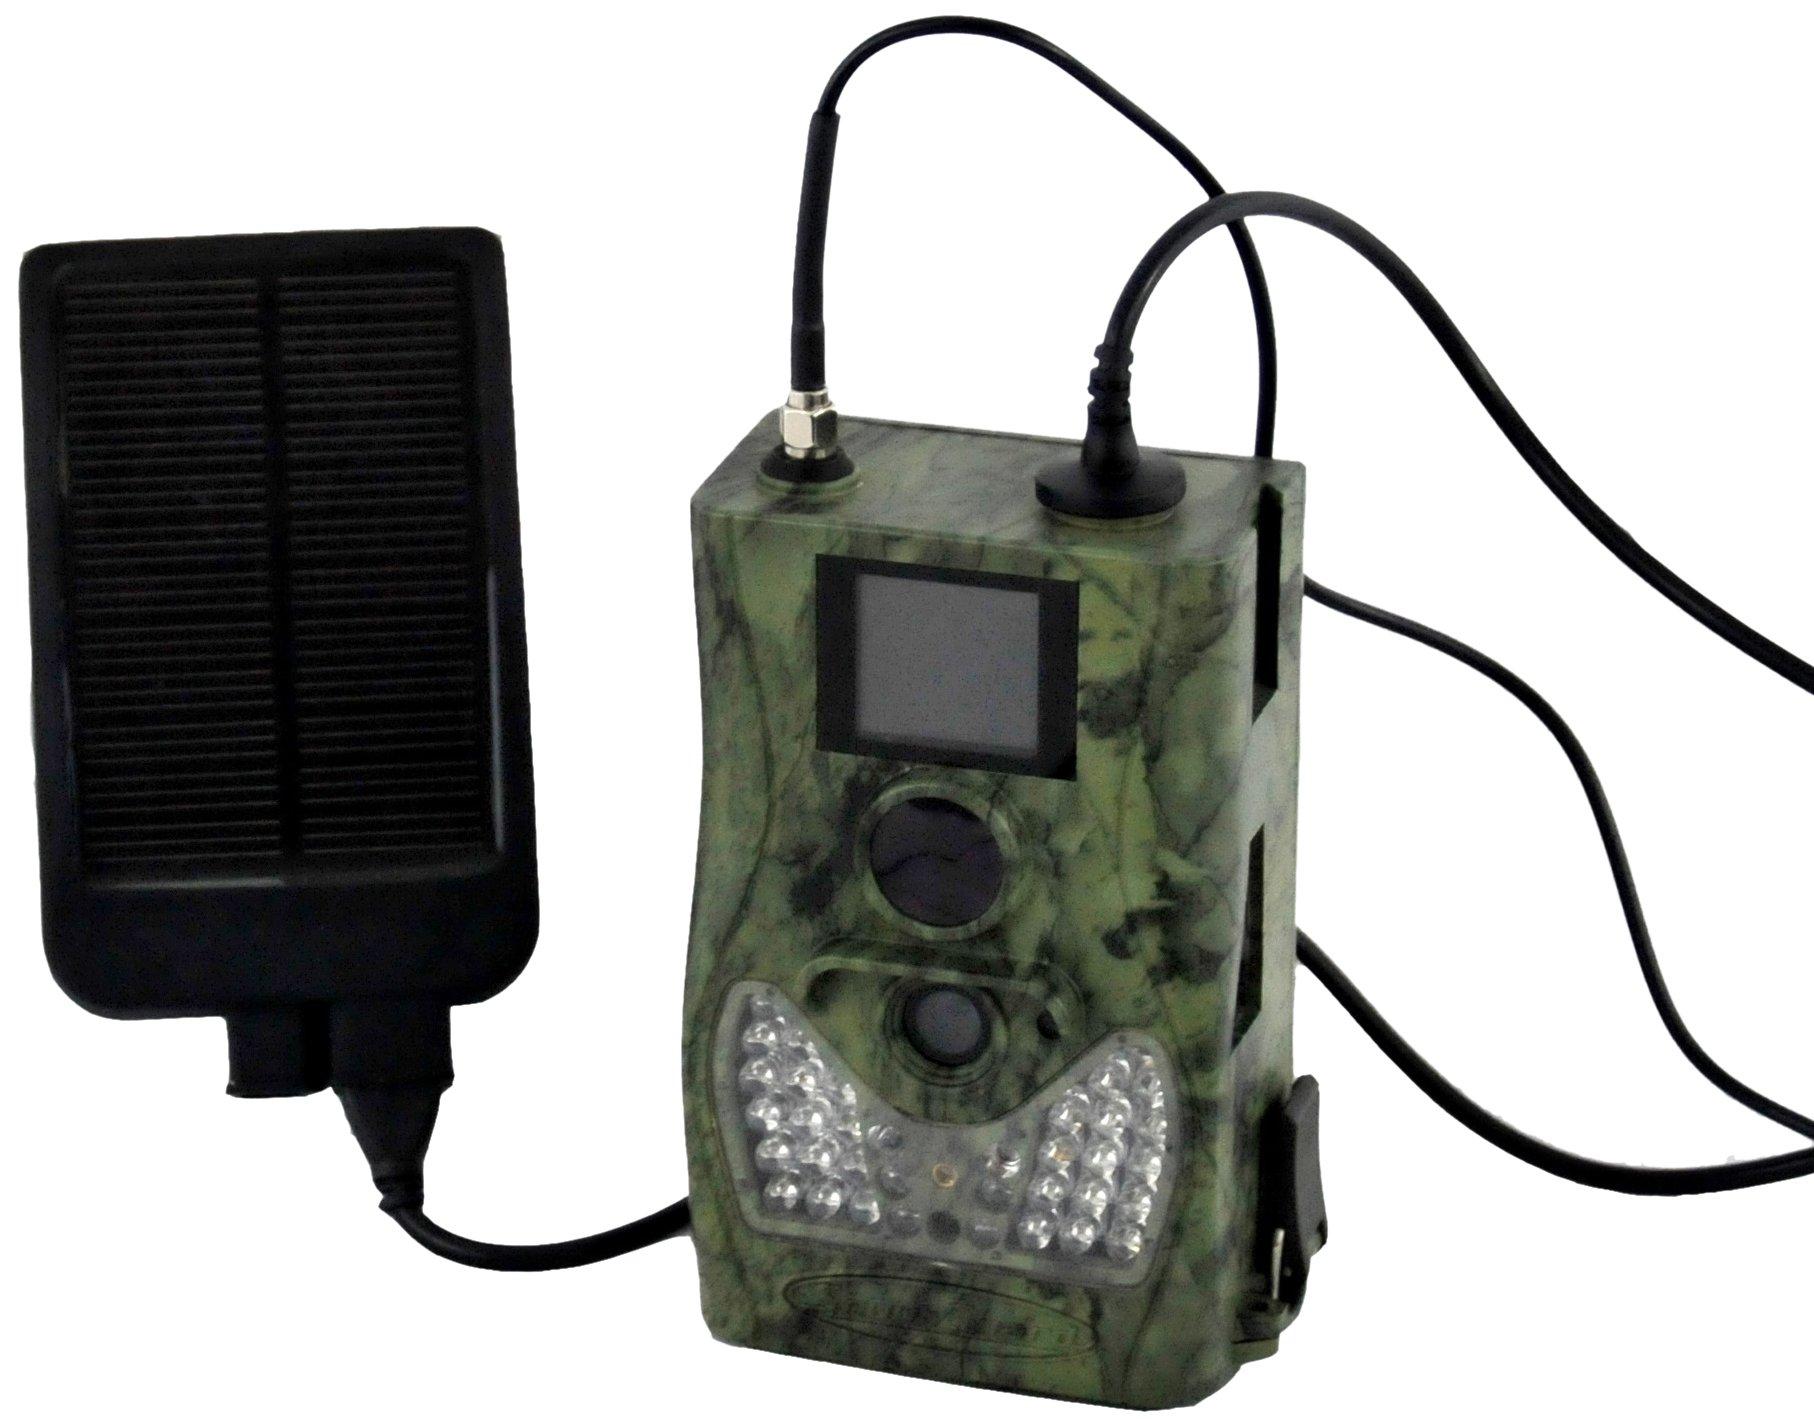 ScoutGuard 8G SG580M-8M GPRS MMS Hunting Trail Camera Plus 6V Solar Battery Metal Box by ScoutGuard